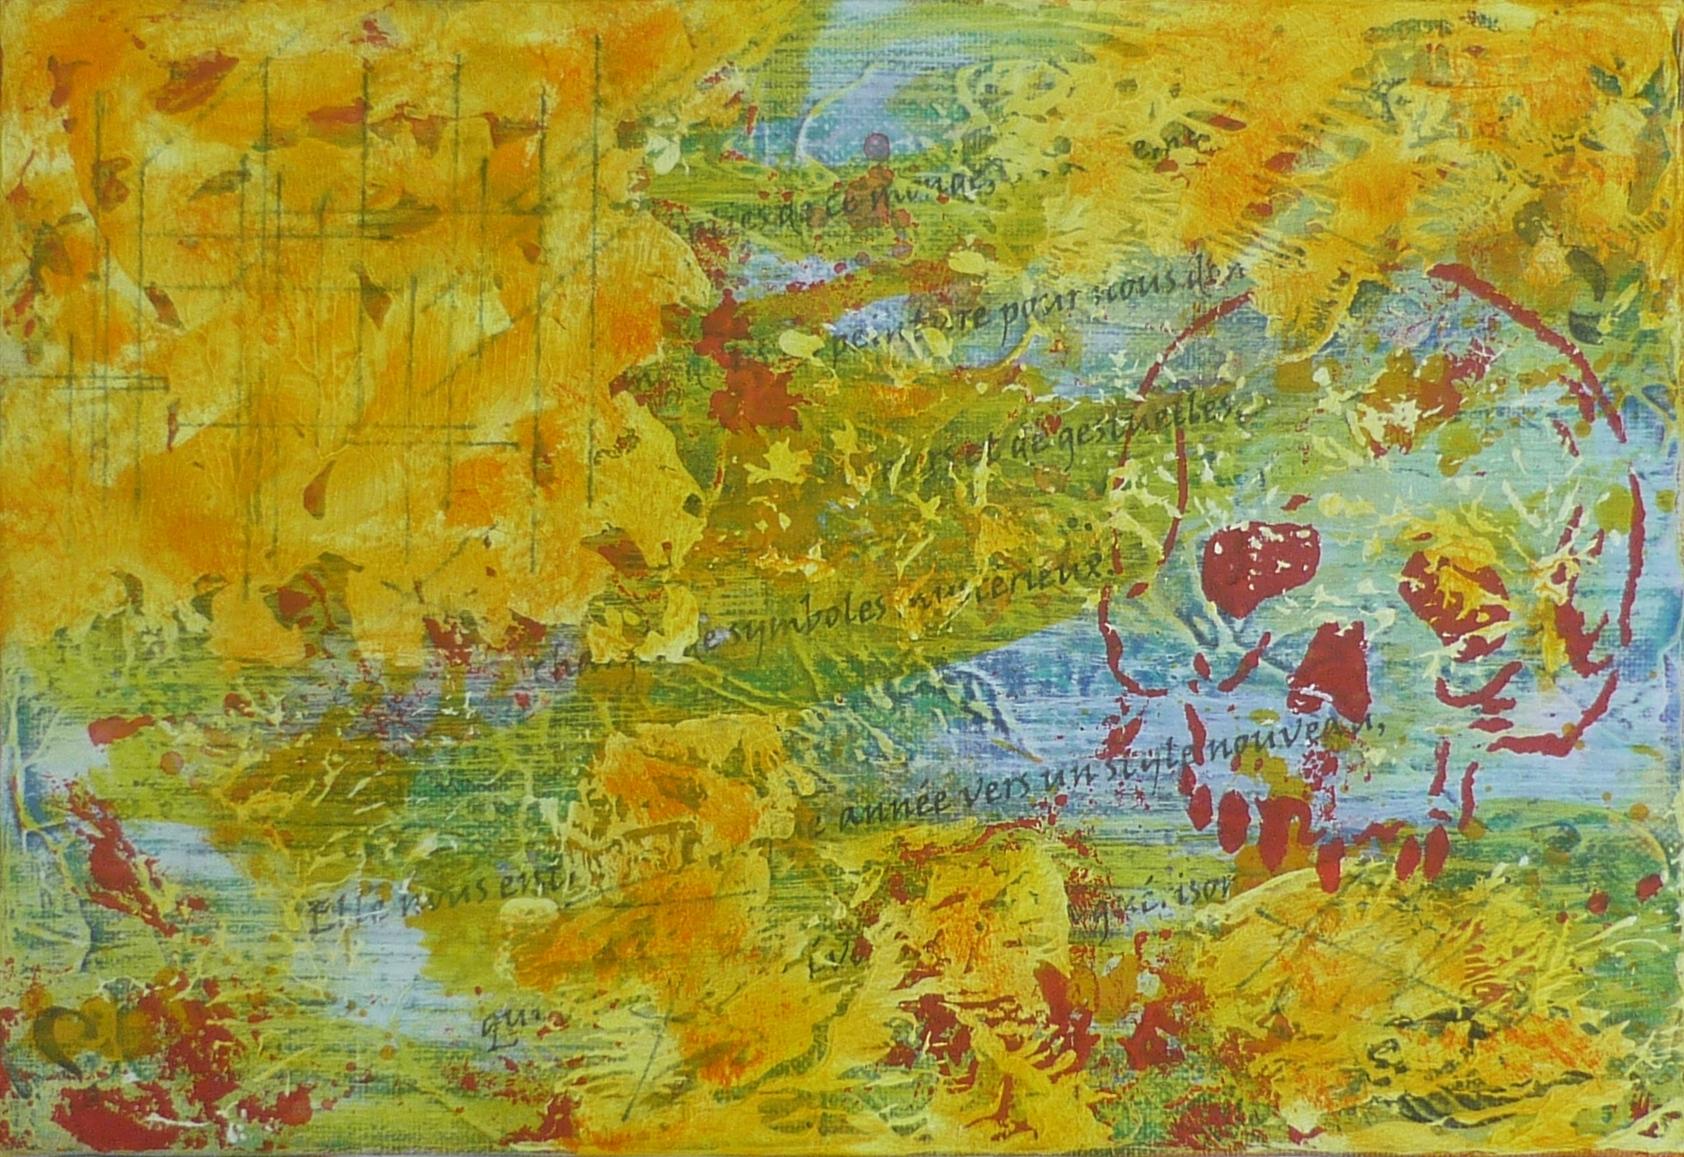 Art expressionniste abstrait du peintre Io. Lagana